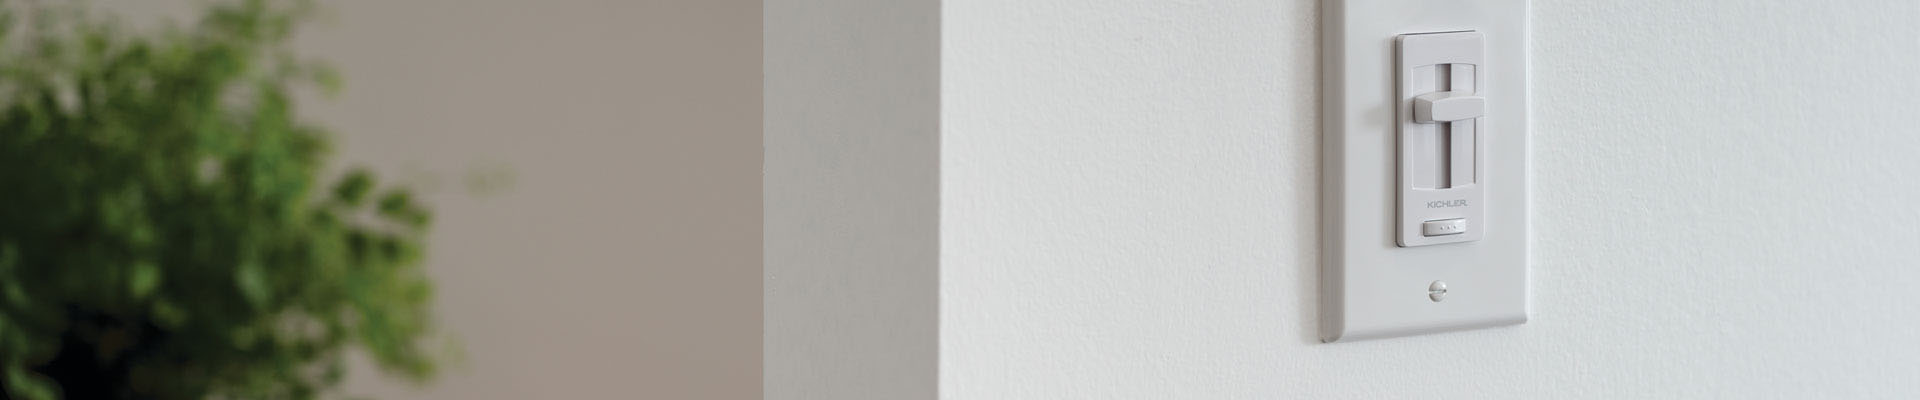 Dimmer Compatibility Kichler Lighting